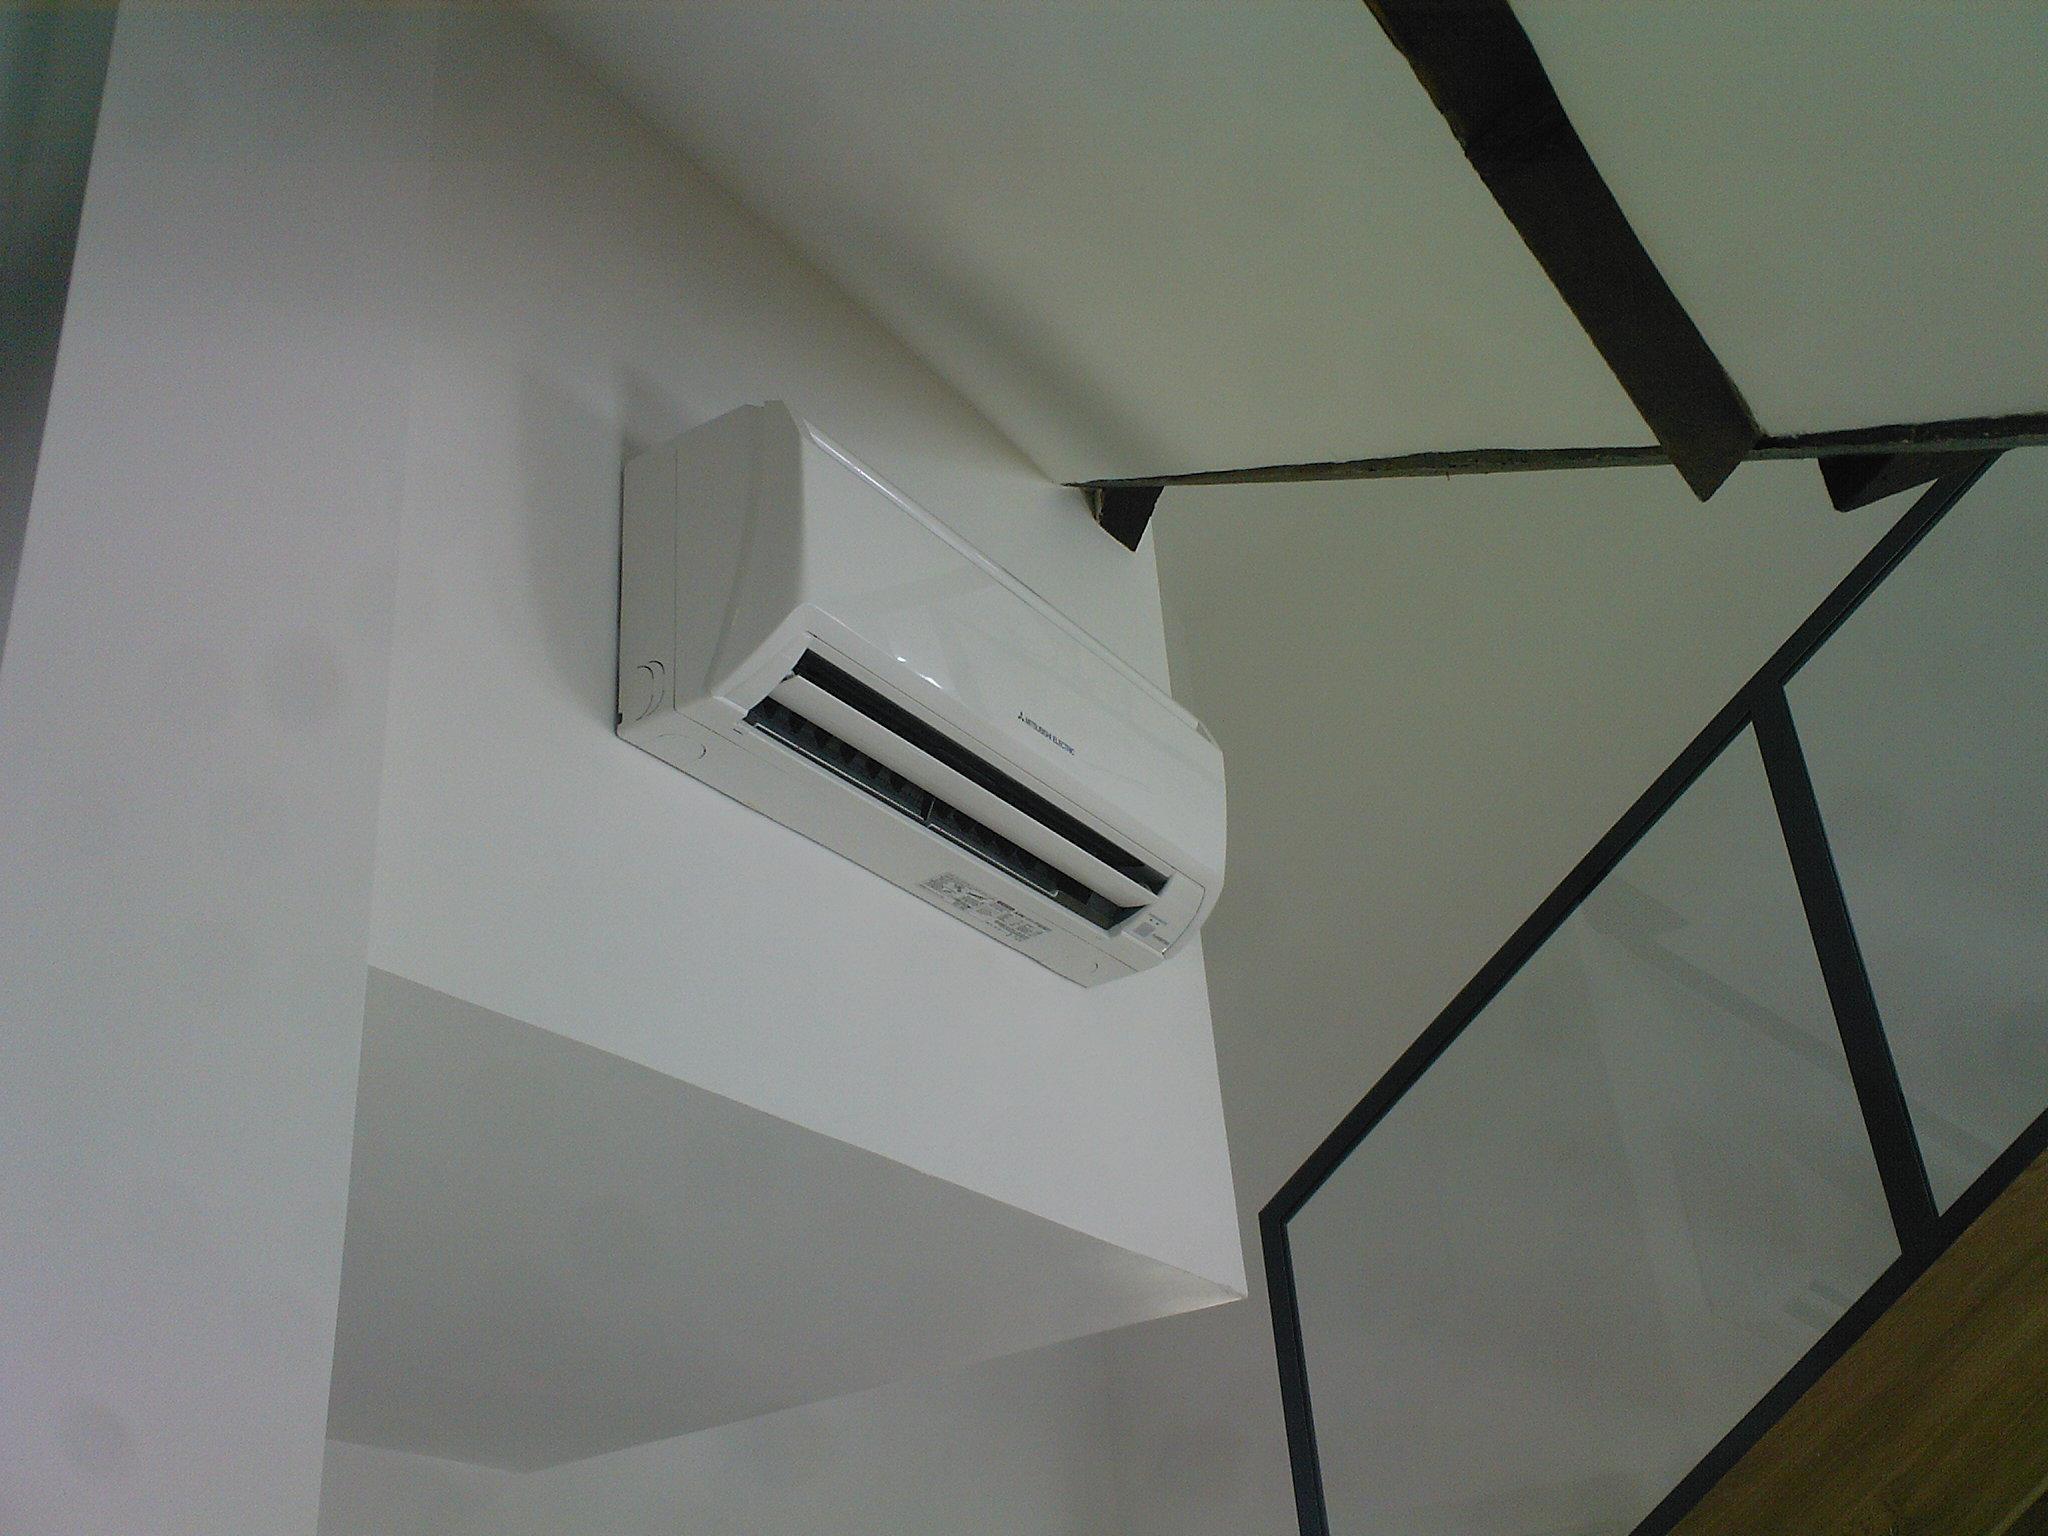 le mural climatisation design et conomique. Black Bedroom Furniture Sets. Home Design Ideas